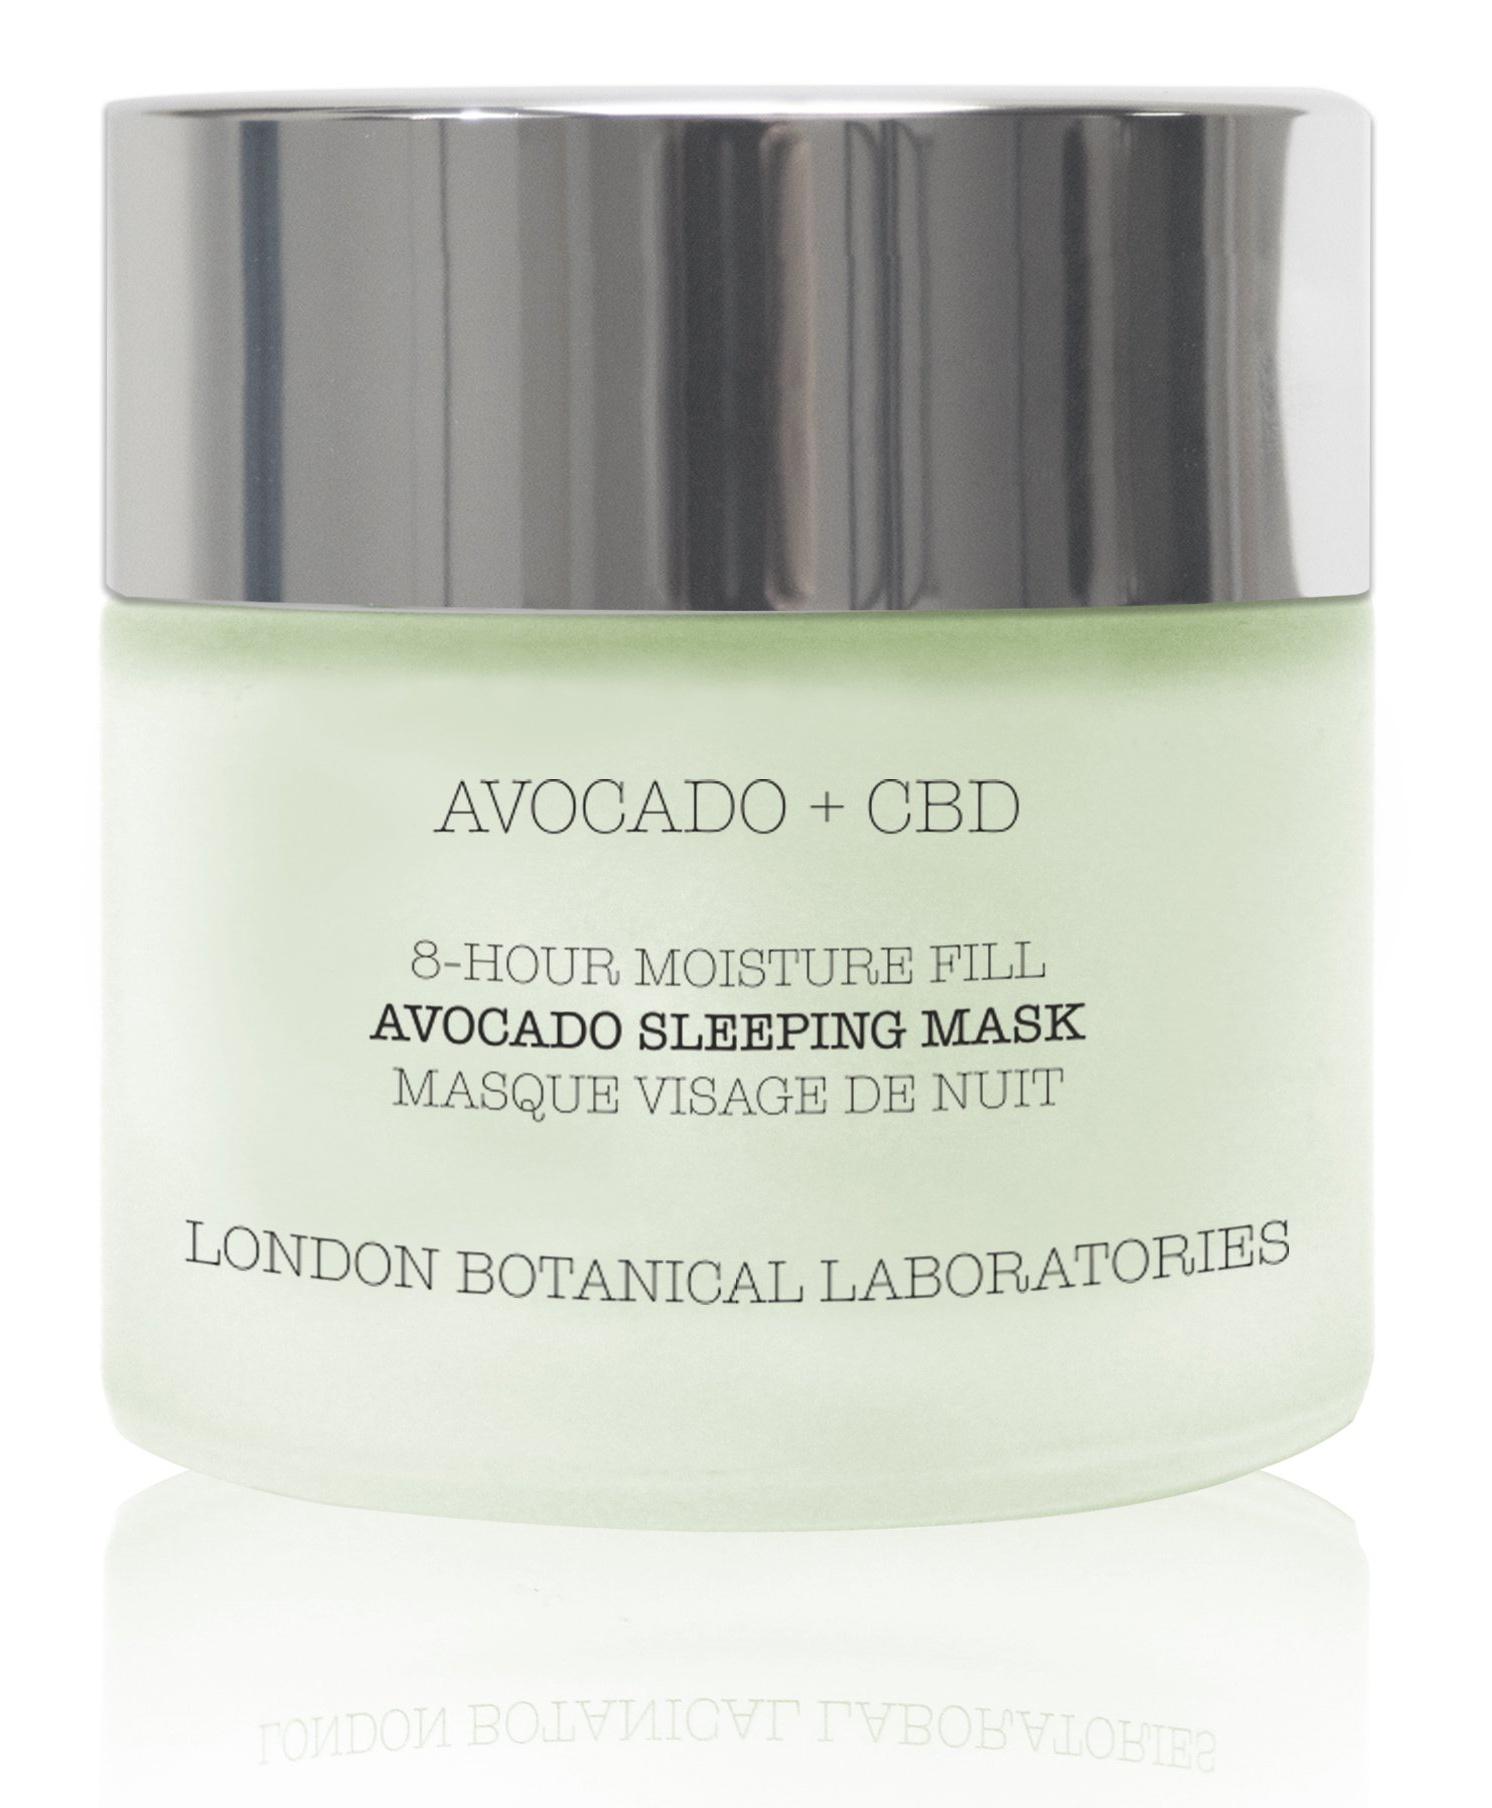 London Botanical Laboratories Avocado + CBD | 8-Hour Moisture Fill Avocado Sleeping Mask